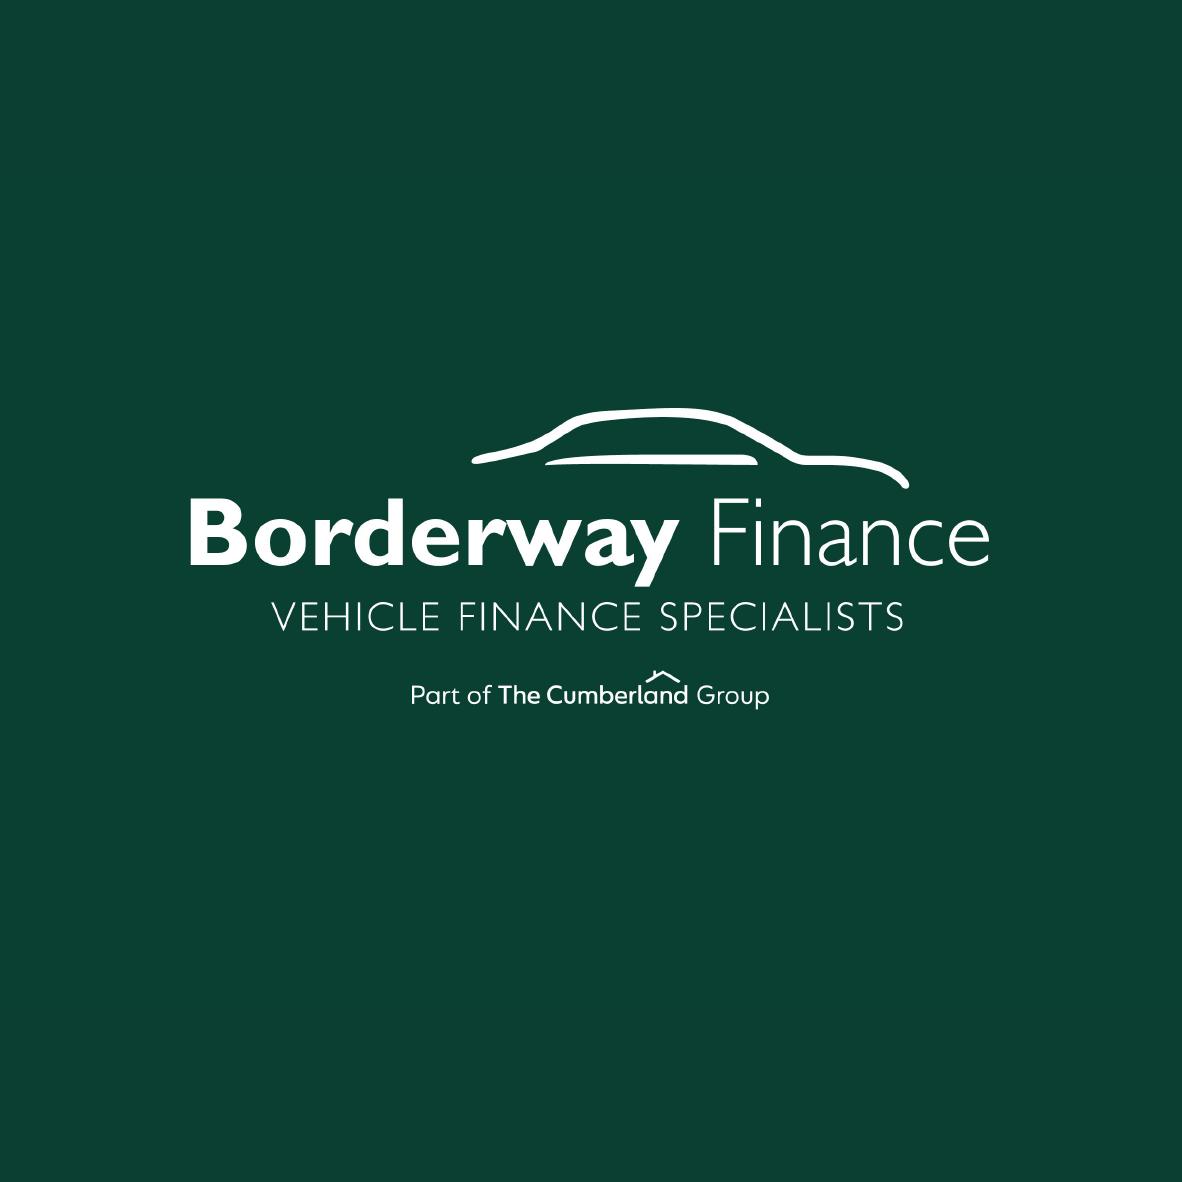 Borderway Finance